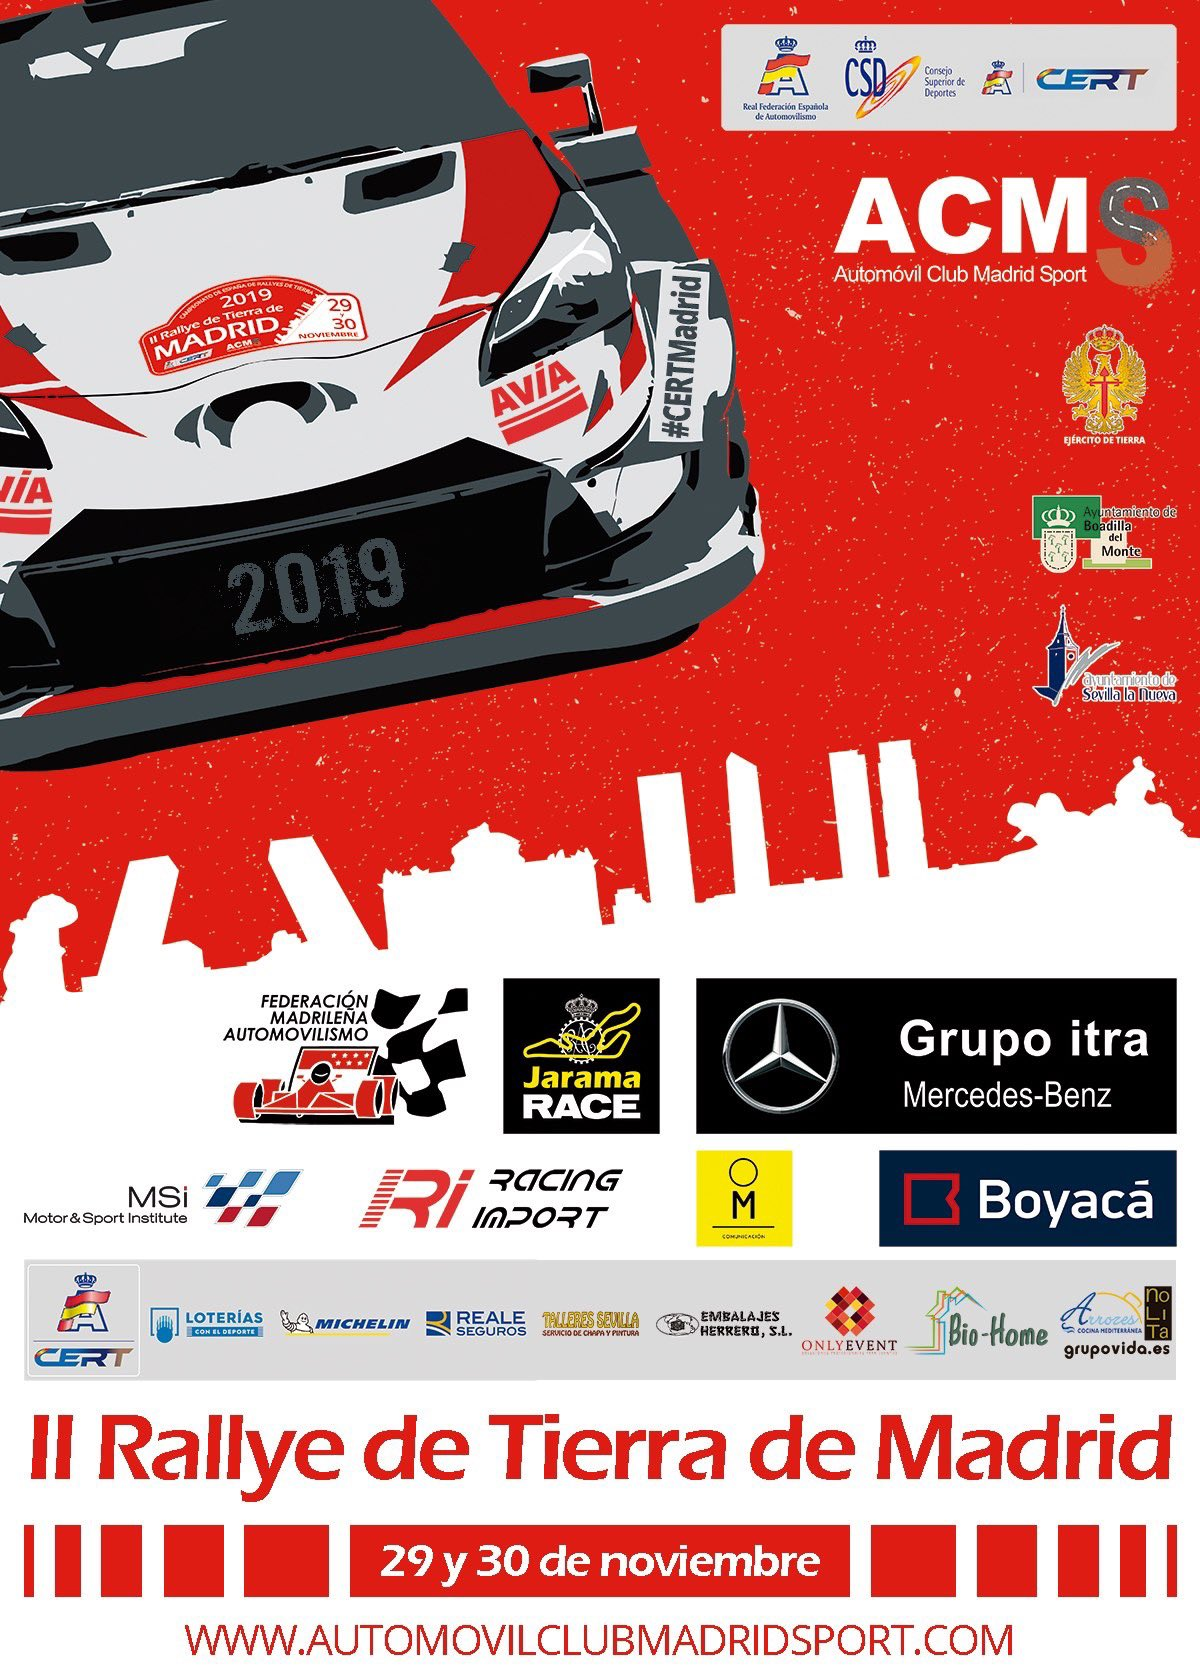 CERT: 2º Rallye de Tierra de Madrid [29-30 Noviembre] EJ2LHLXW4AAt1sX?format=jpg&name=large